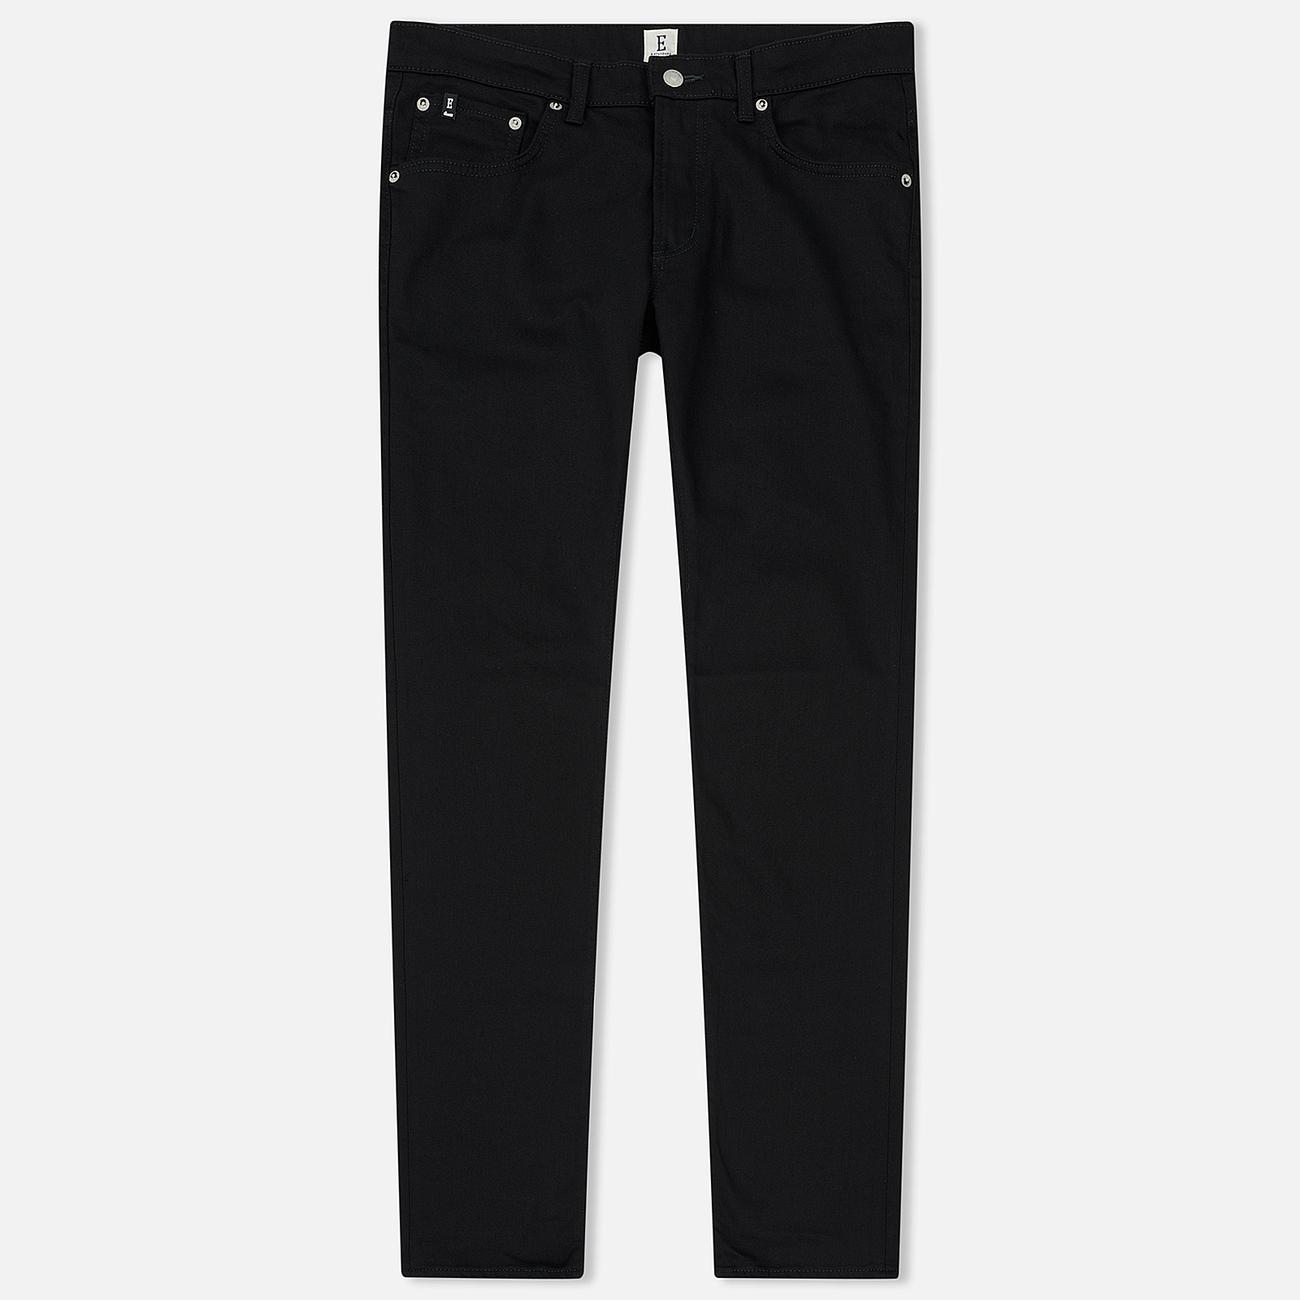 Мужские джинсы Edwin Modern Regular Tapered Kaihara Black Stretch Fabric 13 Oz Rinsed